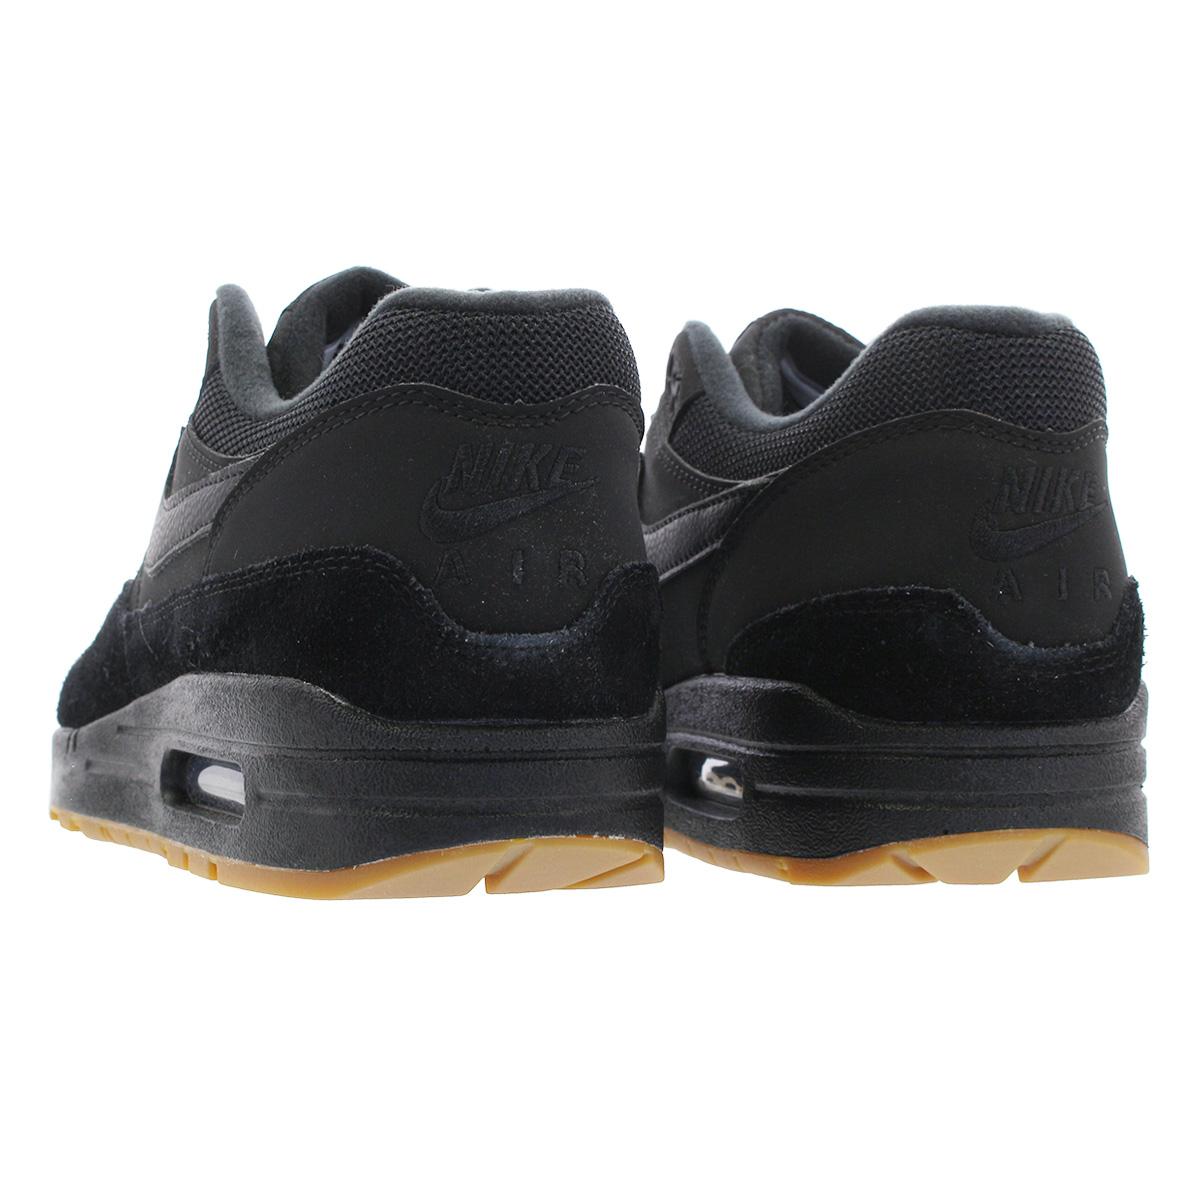 online retailer 2b2b7 07431 ... NIKE AIR MAX 1 Kie Ney AMAX 1 BLACK BLACK BLACK GUM MEDIUM ...